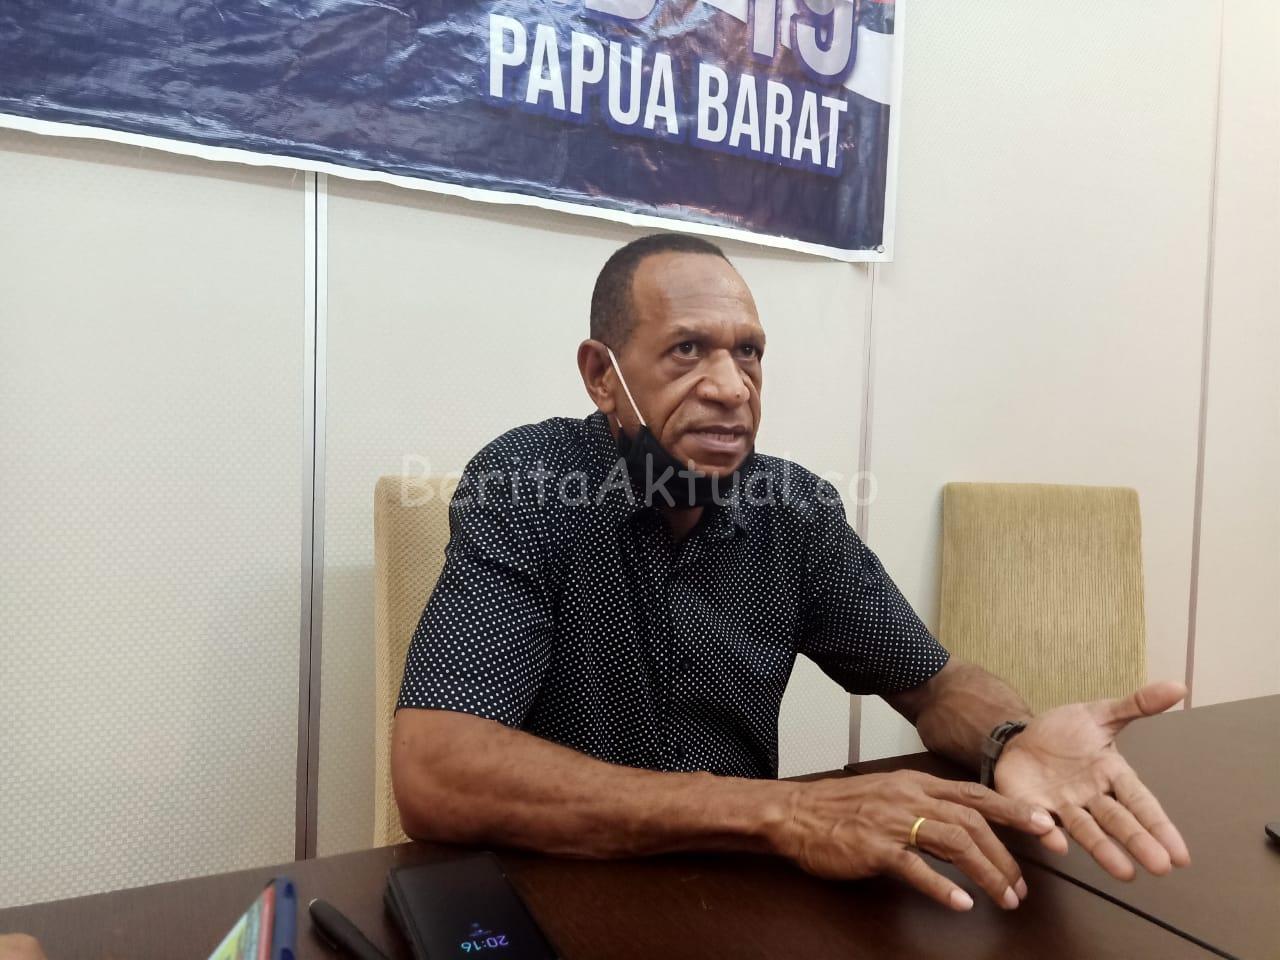 Tambah 5 Orang Positif Dari Bintuni, Kini Papua Barat Jumlah 42 10 IMG 20200501 WA0065